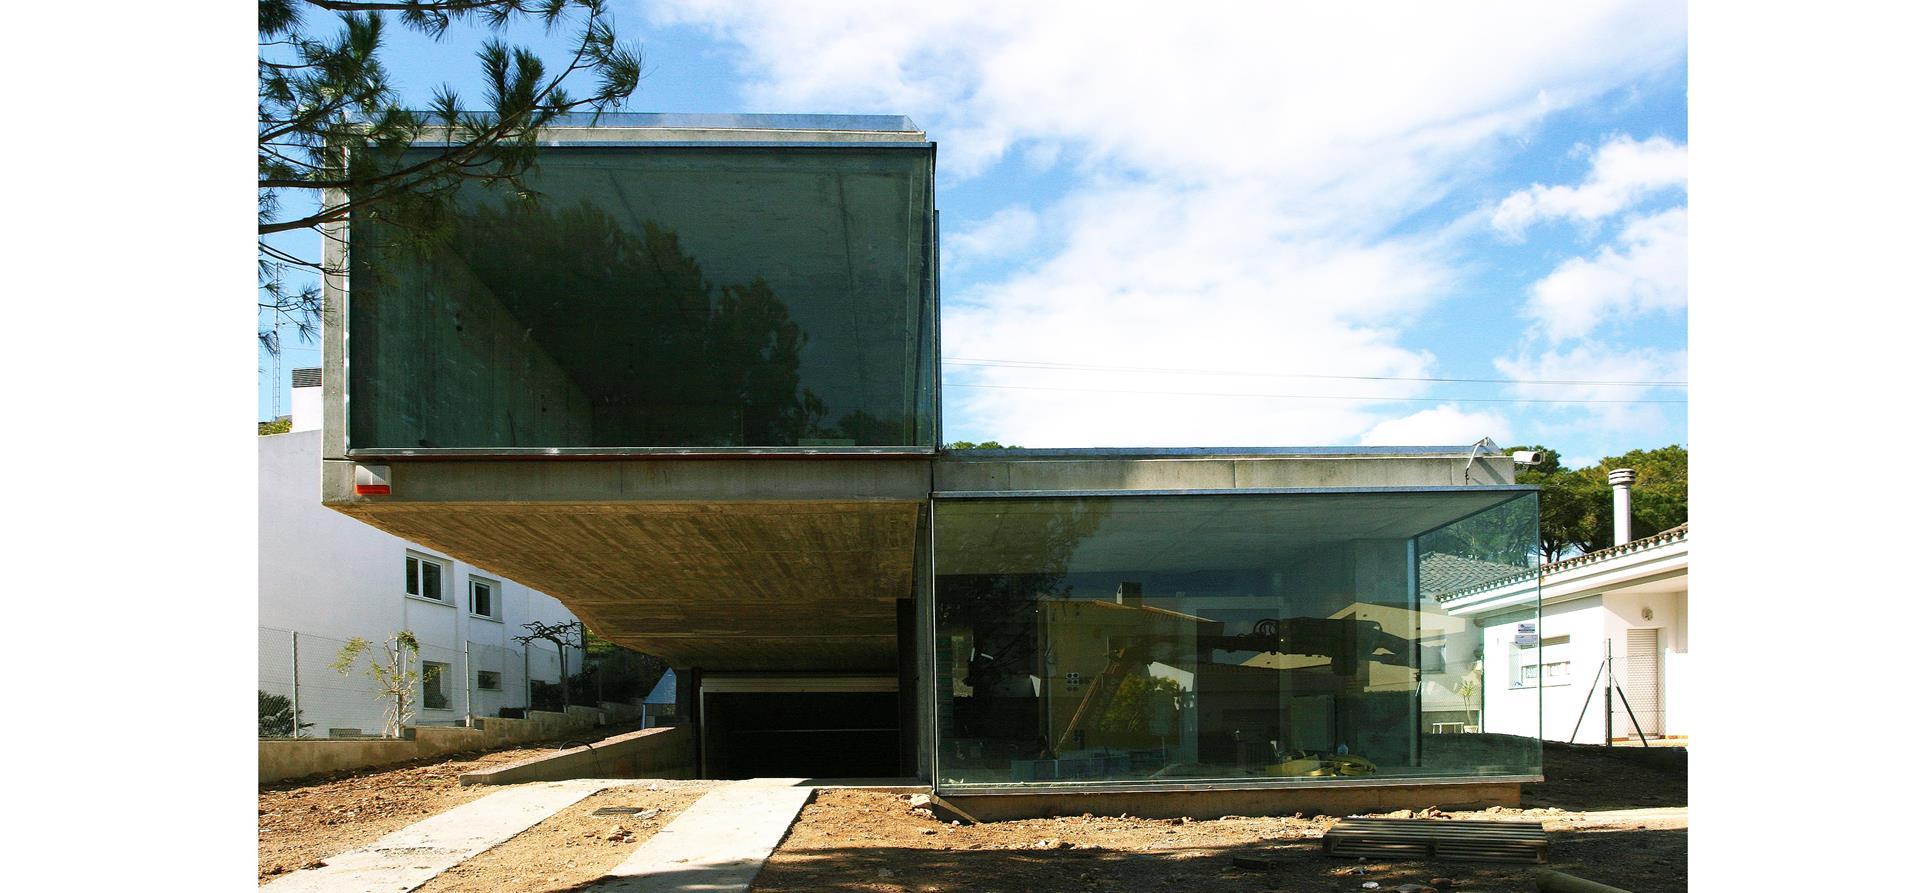 Villa Bio, Habitatge, unifamiliar, Figueres, vivienda, unifamiliar, Family housing, hormigon, concrete, formigó.